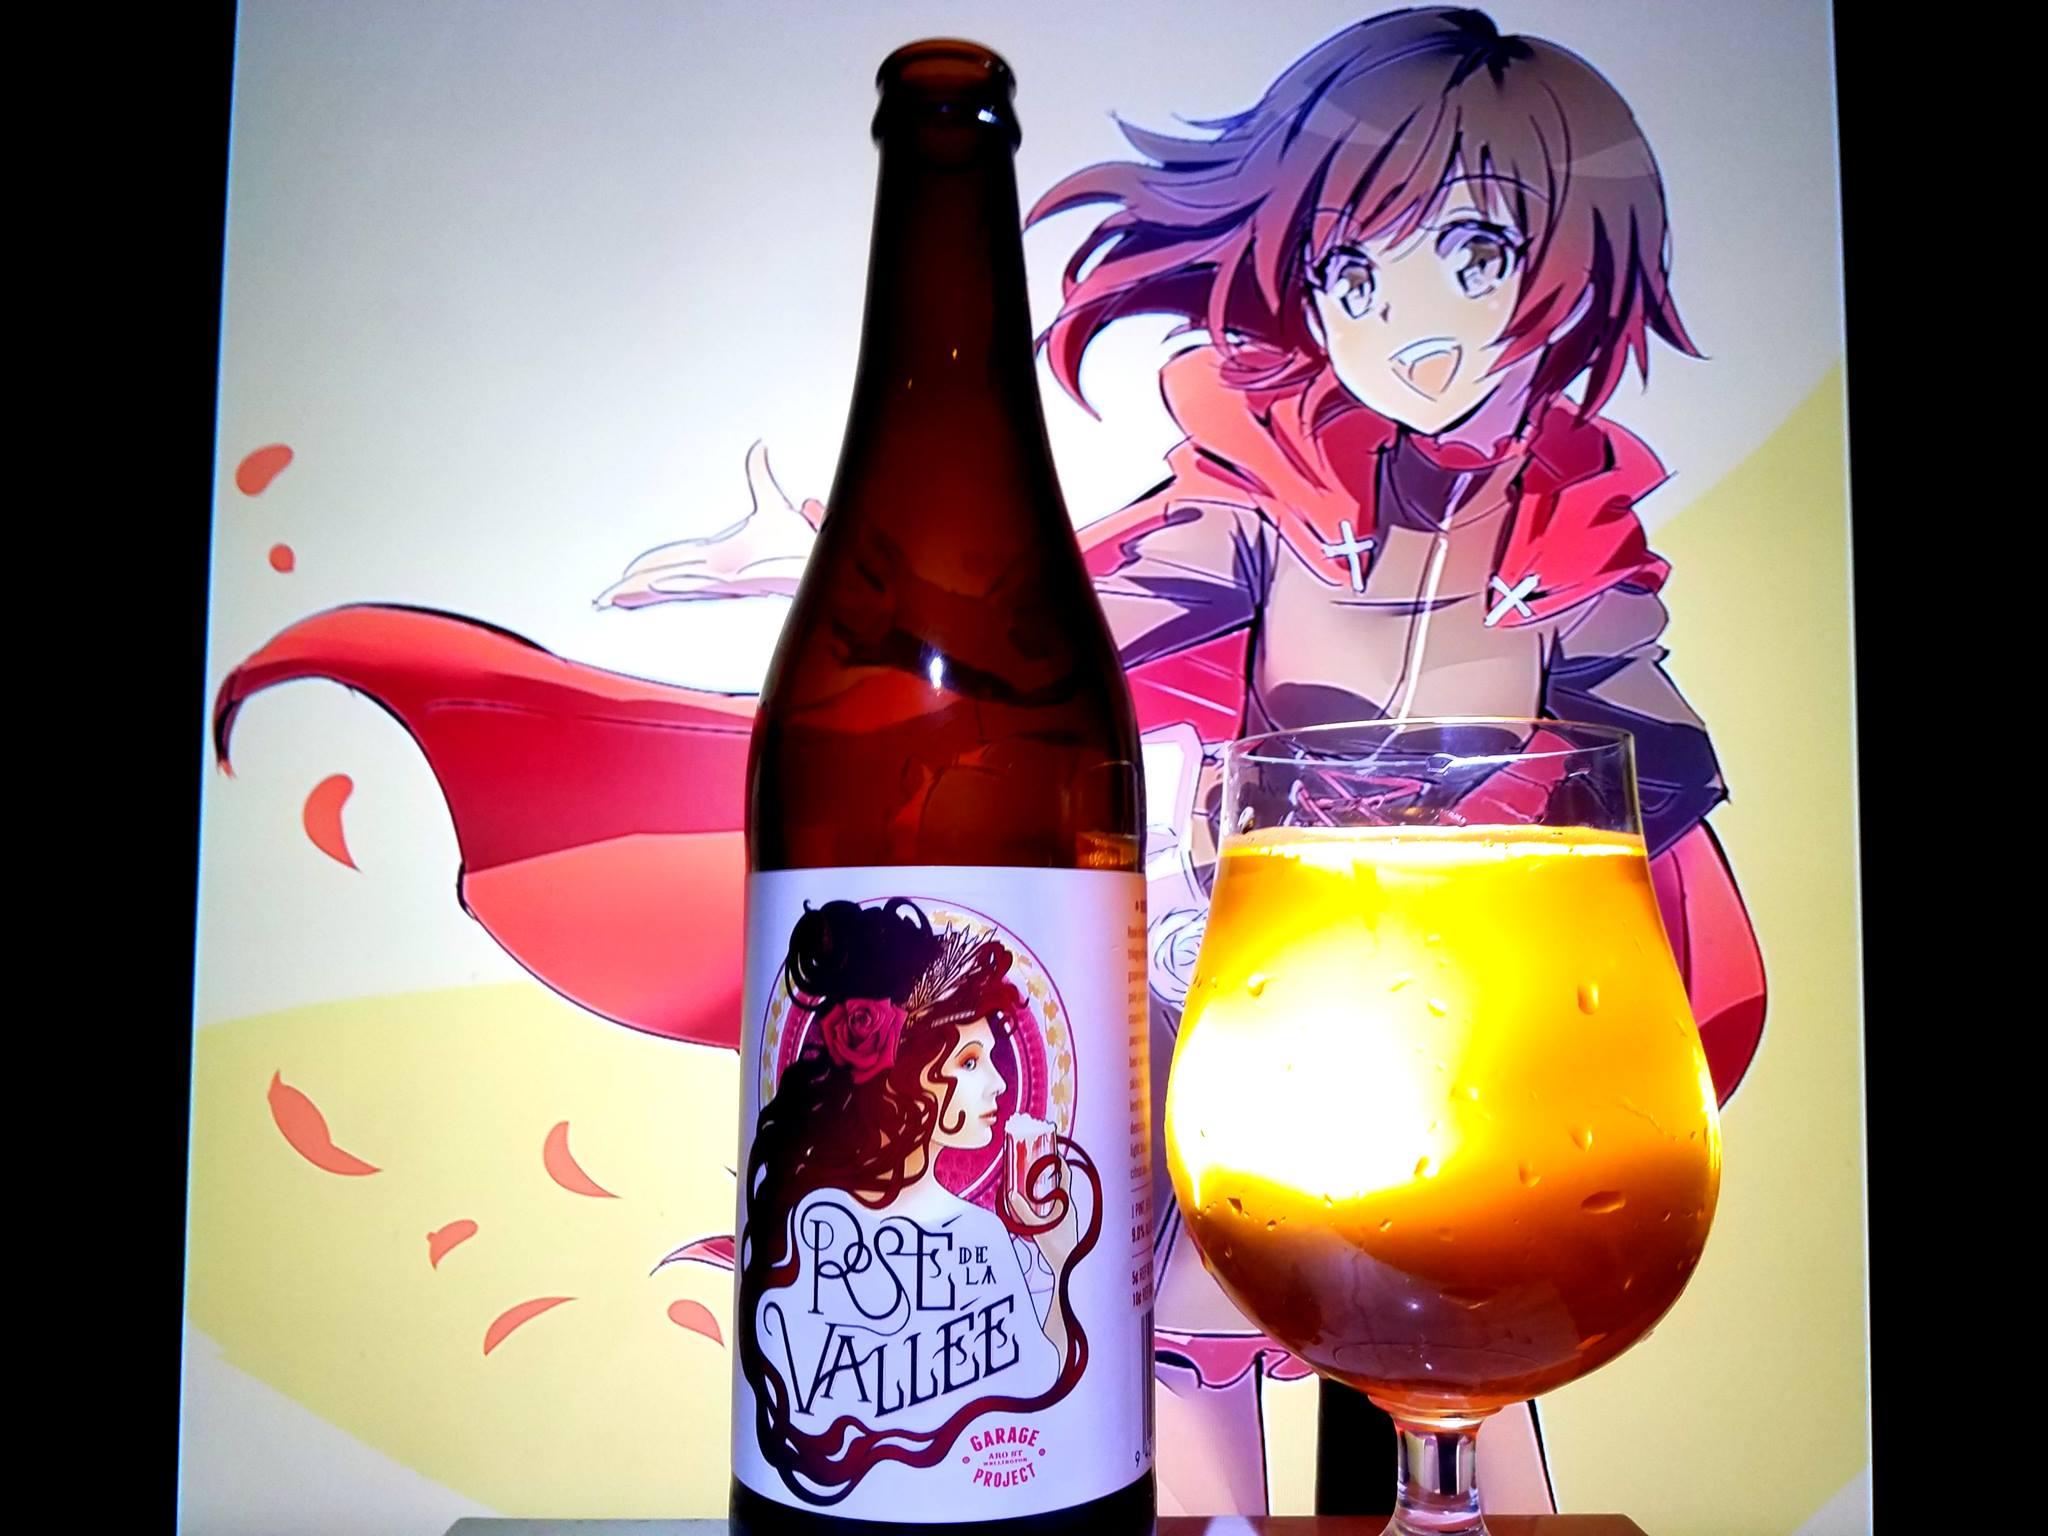 Ros de la vall e by garage project brewerianimelogs anime and beer lore - Garage de la vallee pouzauges ...